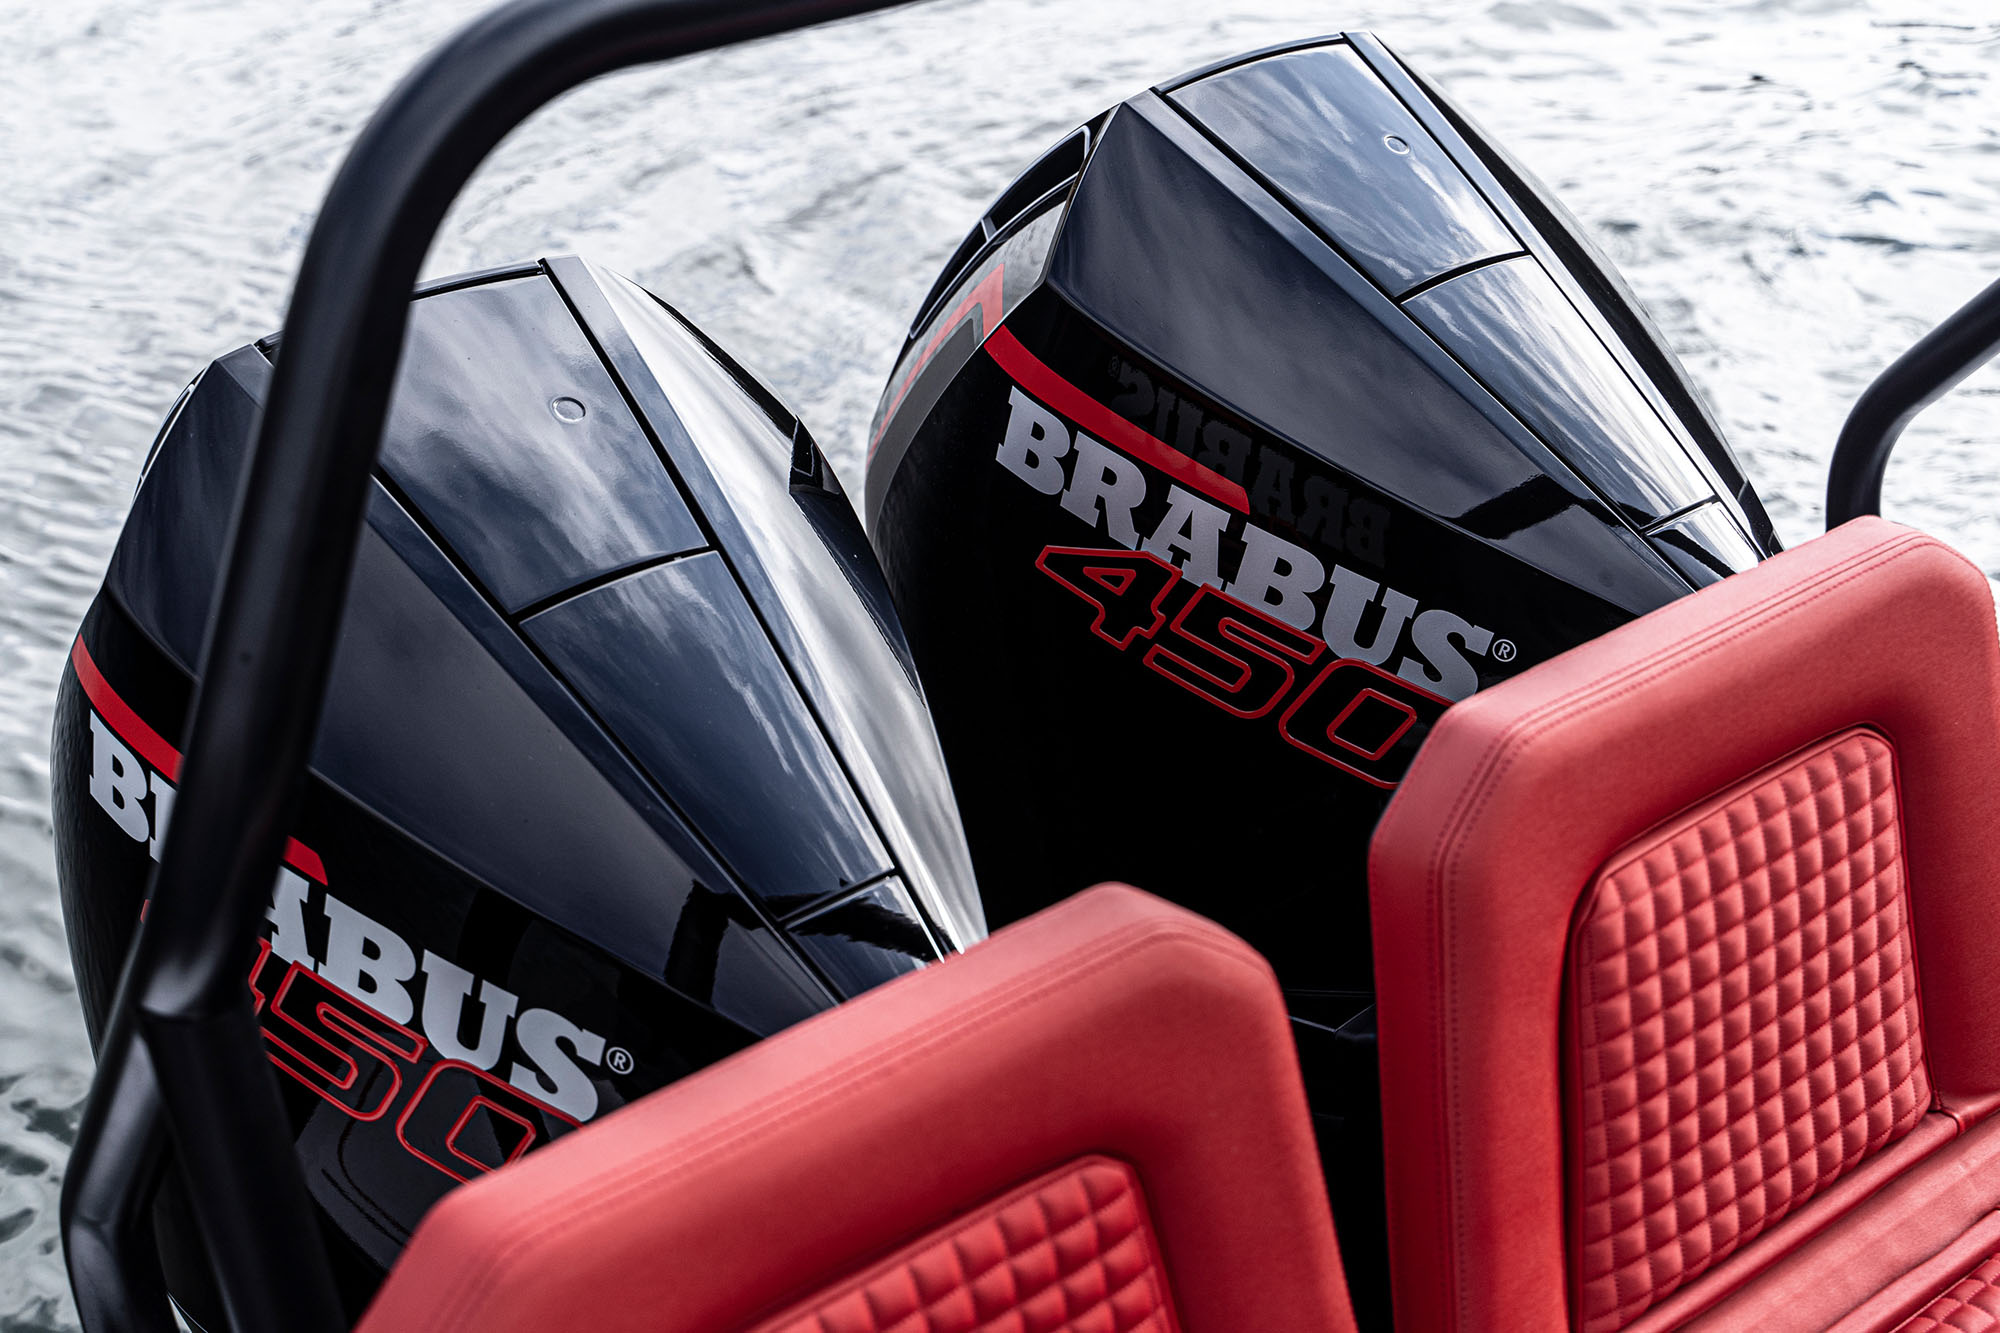 Brabus Shadow 900 XC Limited Edition